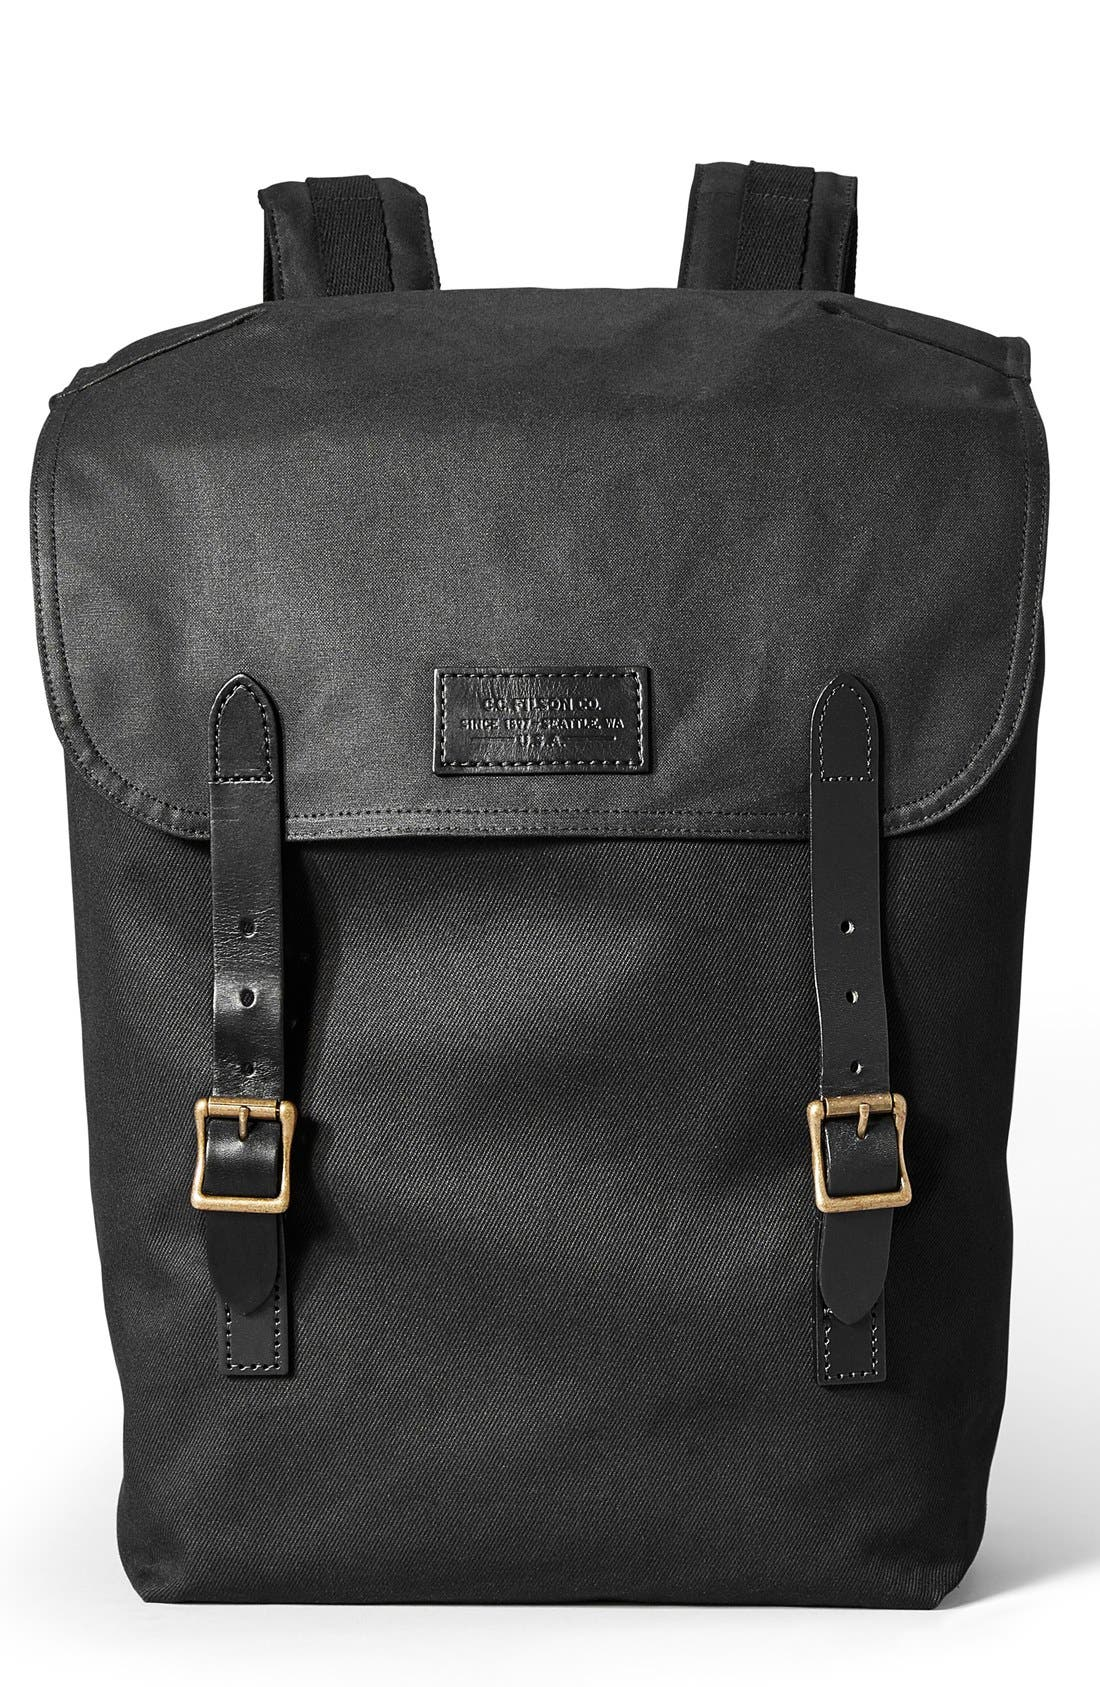 Alternate Image 1 Selected - Filson 'Ranger' Canvas Backpack